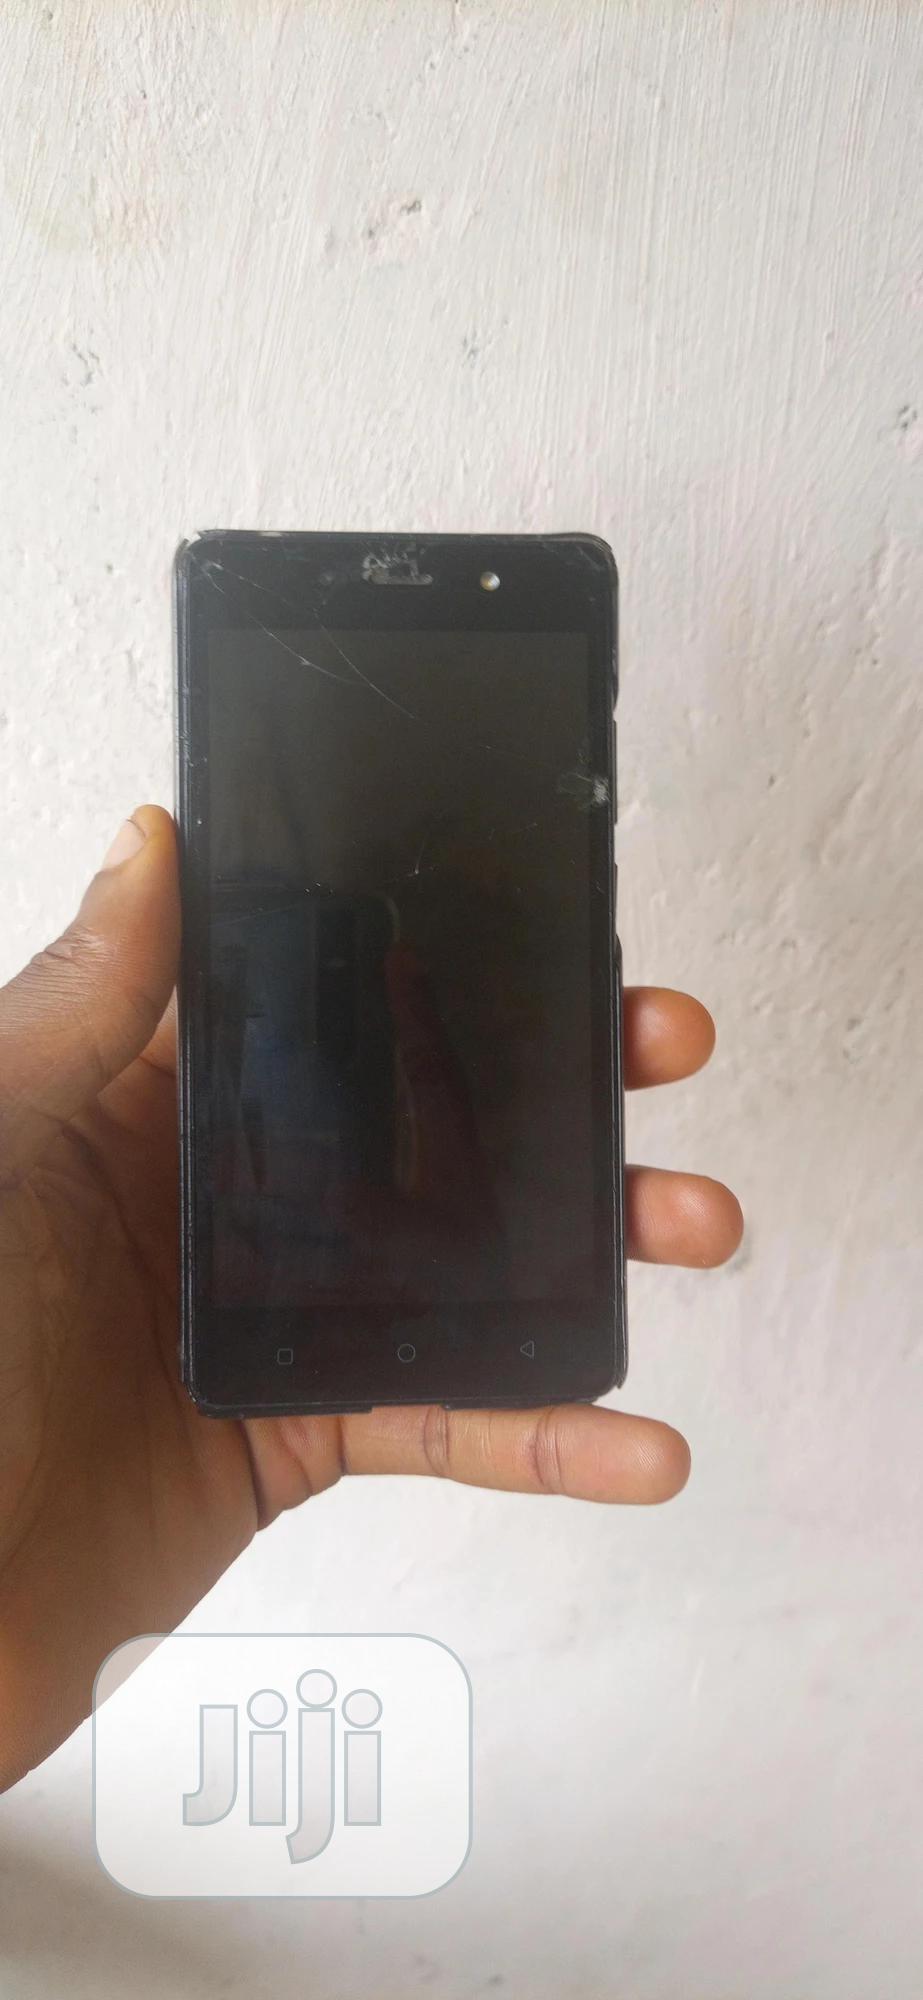 Tecno WX3 P 8 GB Gray | Mobile Phones for sale in Calabar, Cross River State, Nigeria